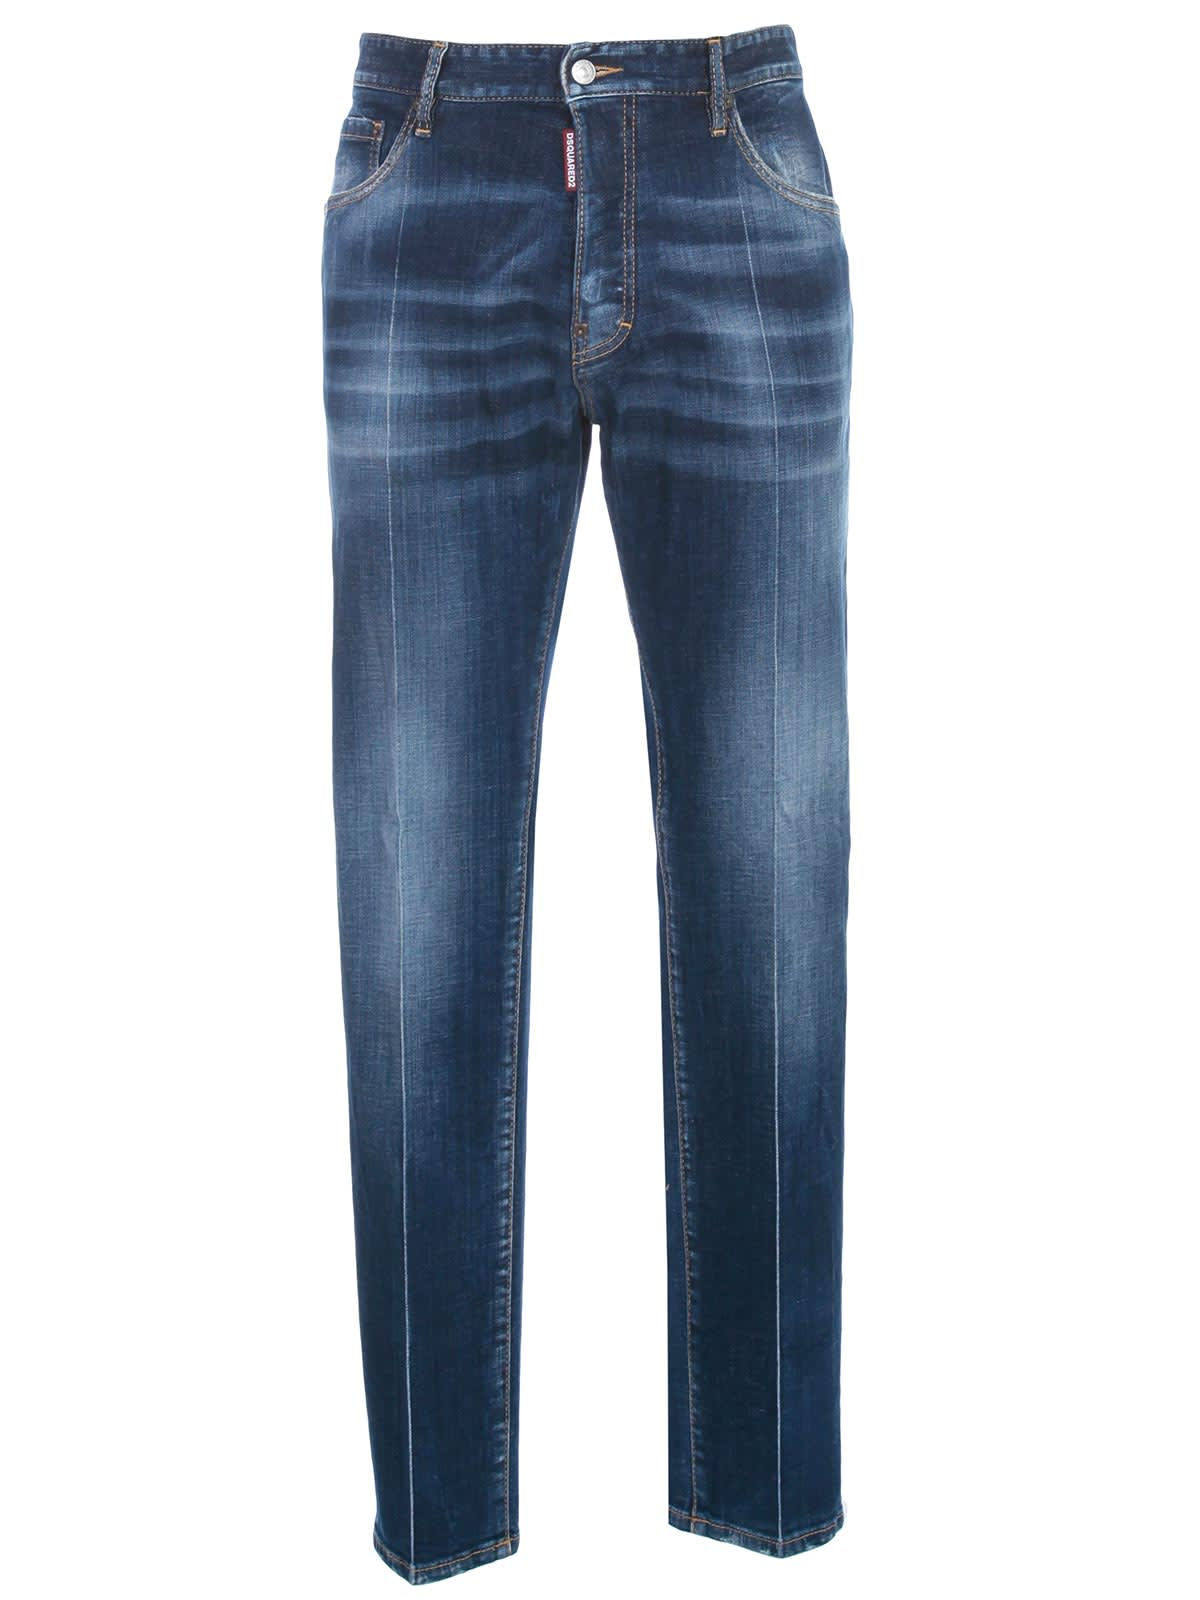 Dsquared2 Jeans Sexy Mercury James Dean Clean Riga Wash